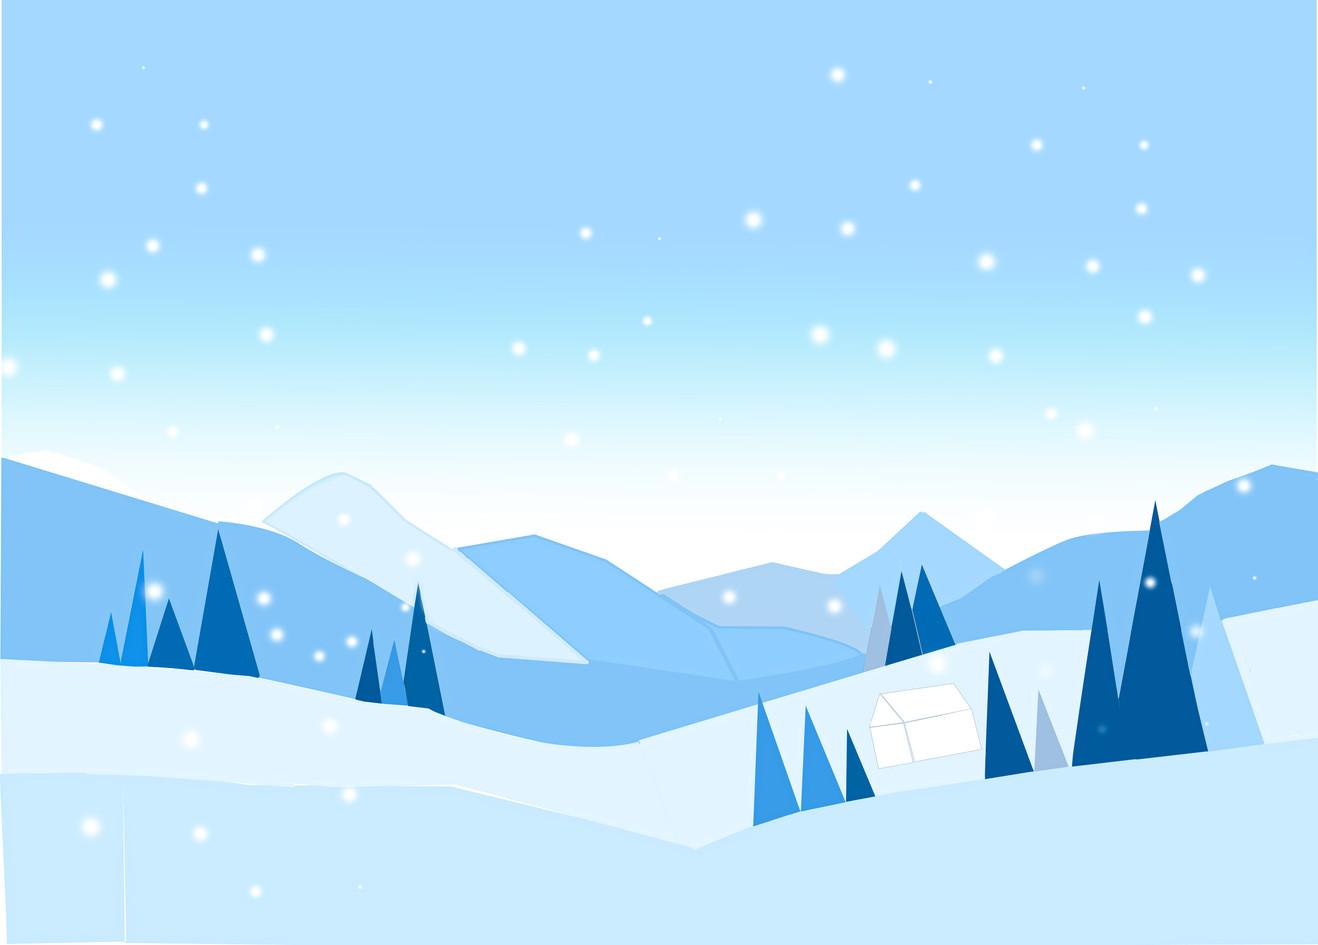 snow and mountain illustration.jpg